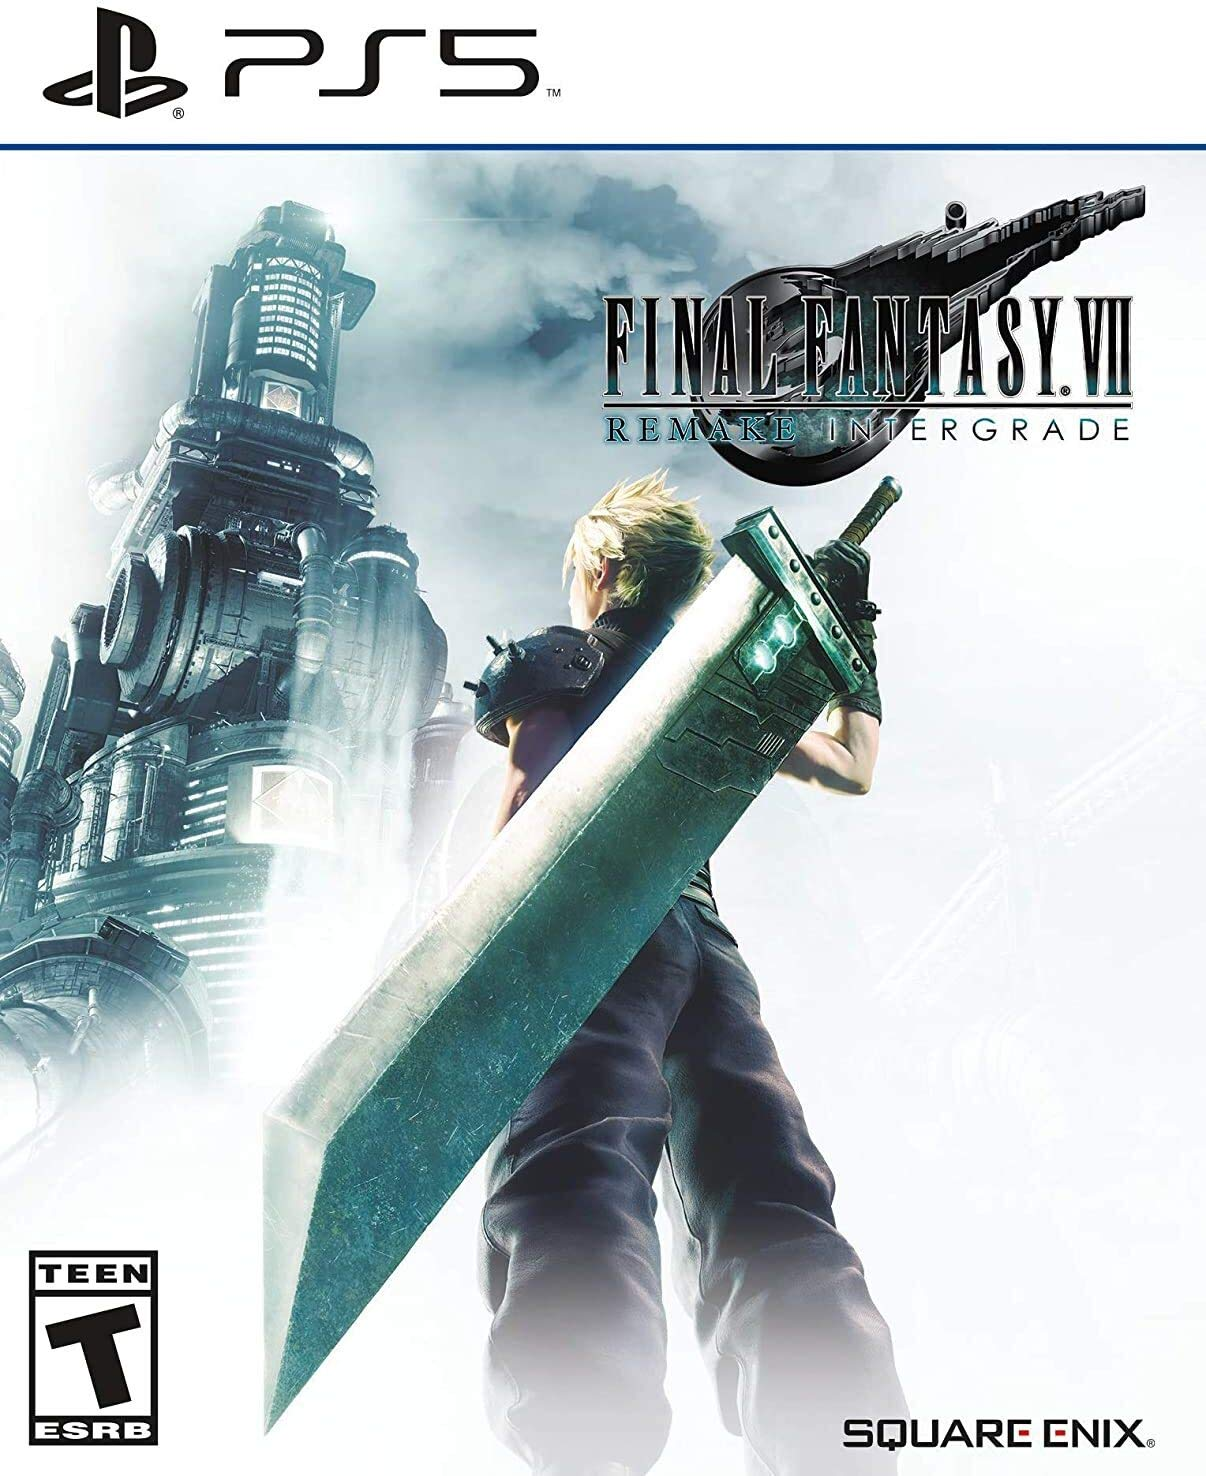 Poster. Final Fantasy 7 Remake Intergrade